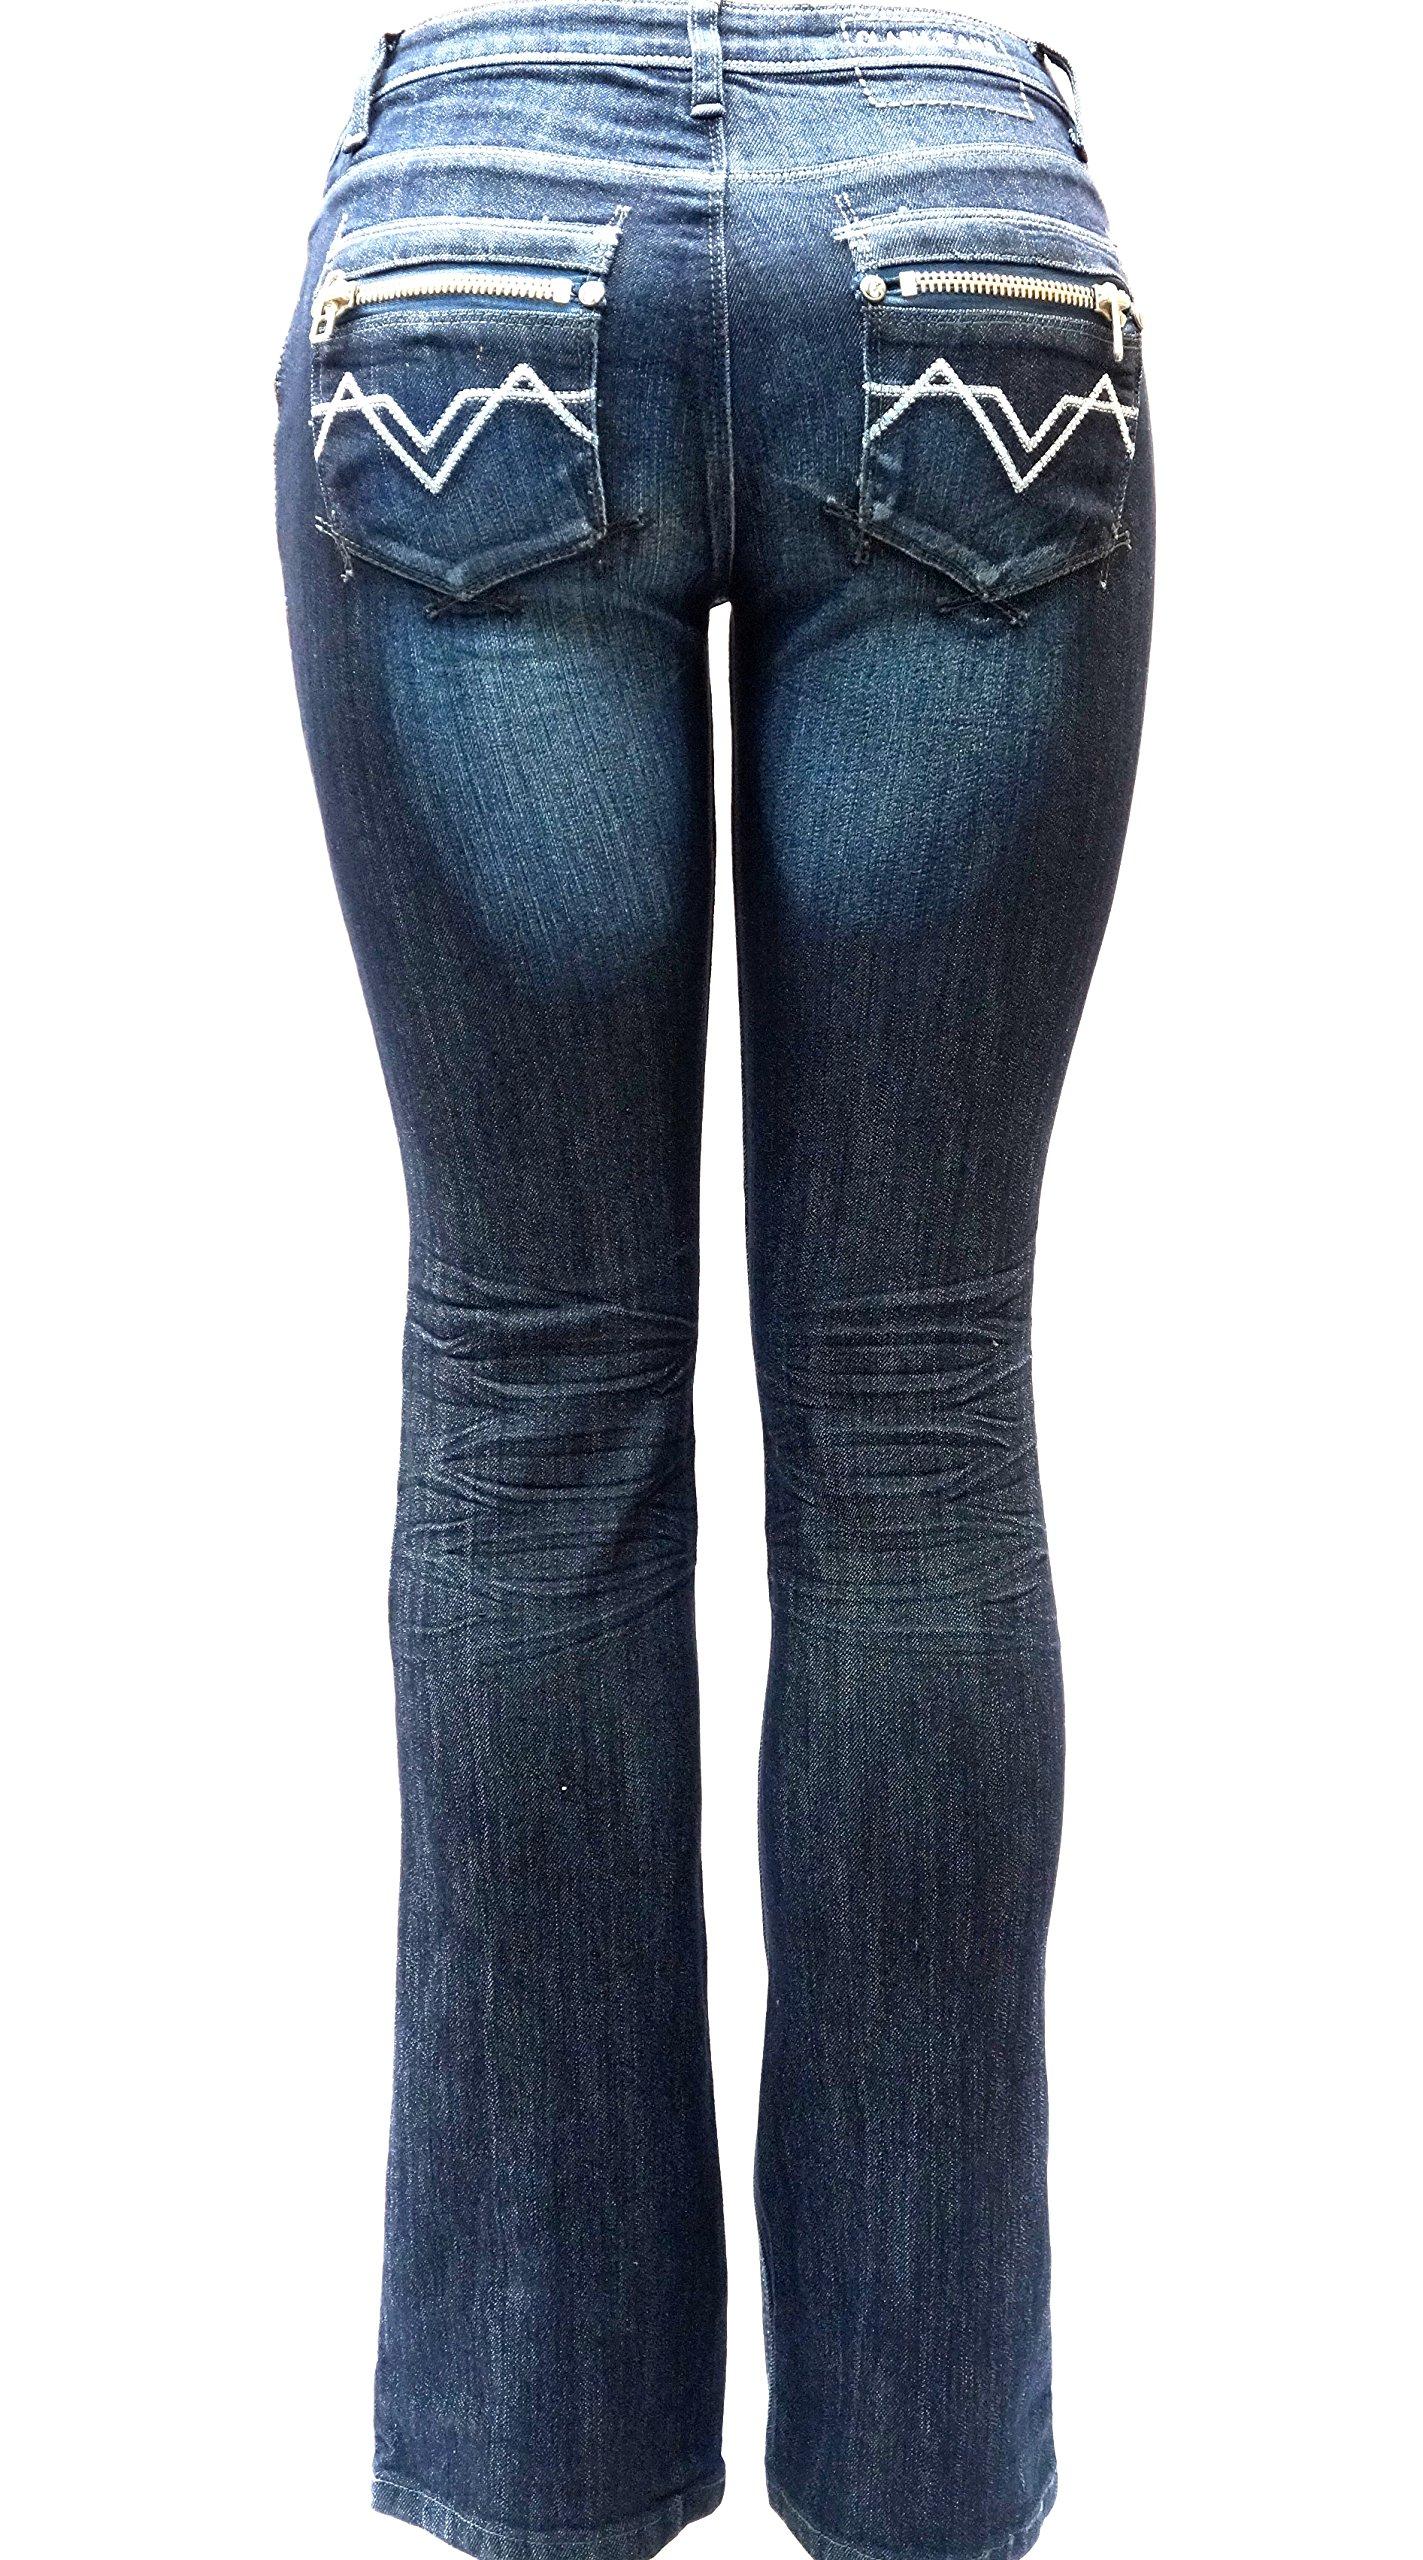 Jully-M Premium Sexy Women's Curvy Basic Bootcut Blue Denim Jeans Stretch Pants (15, Clash Jeans LP-5172 Blue Faded)